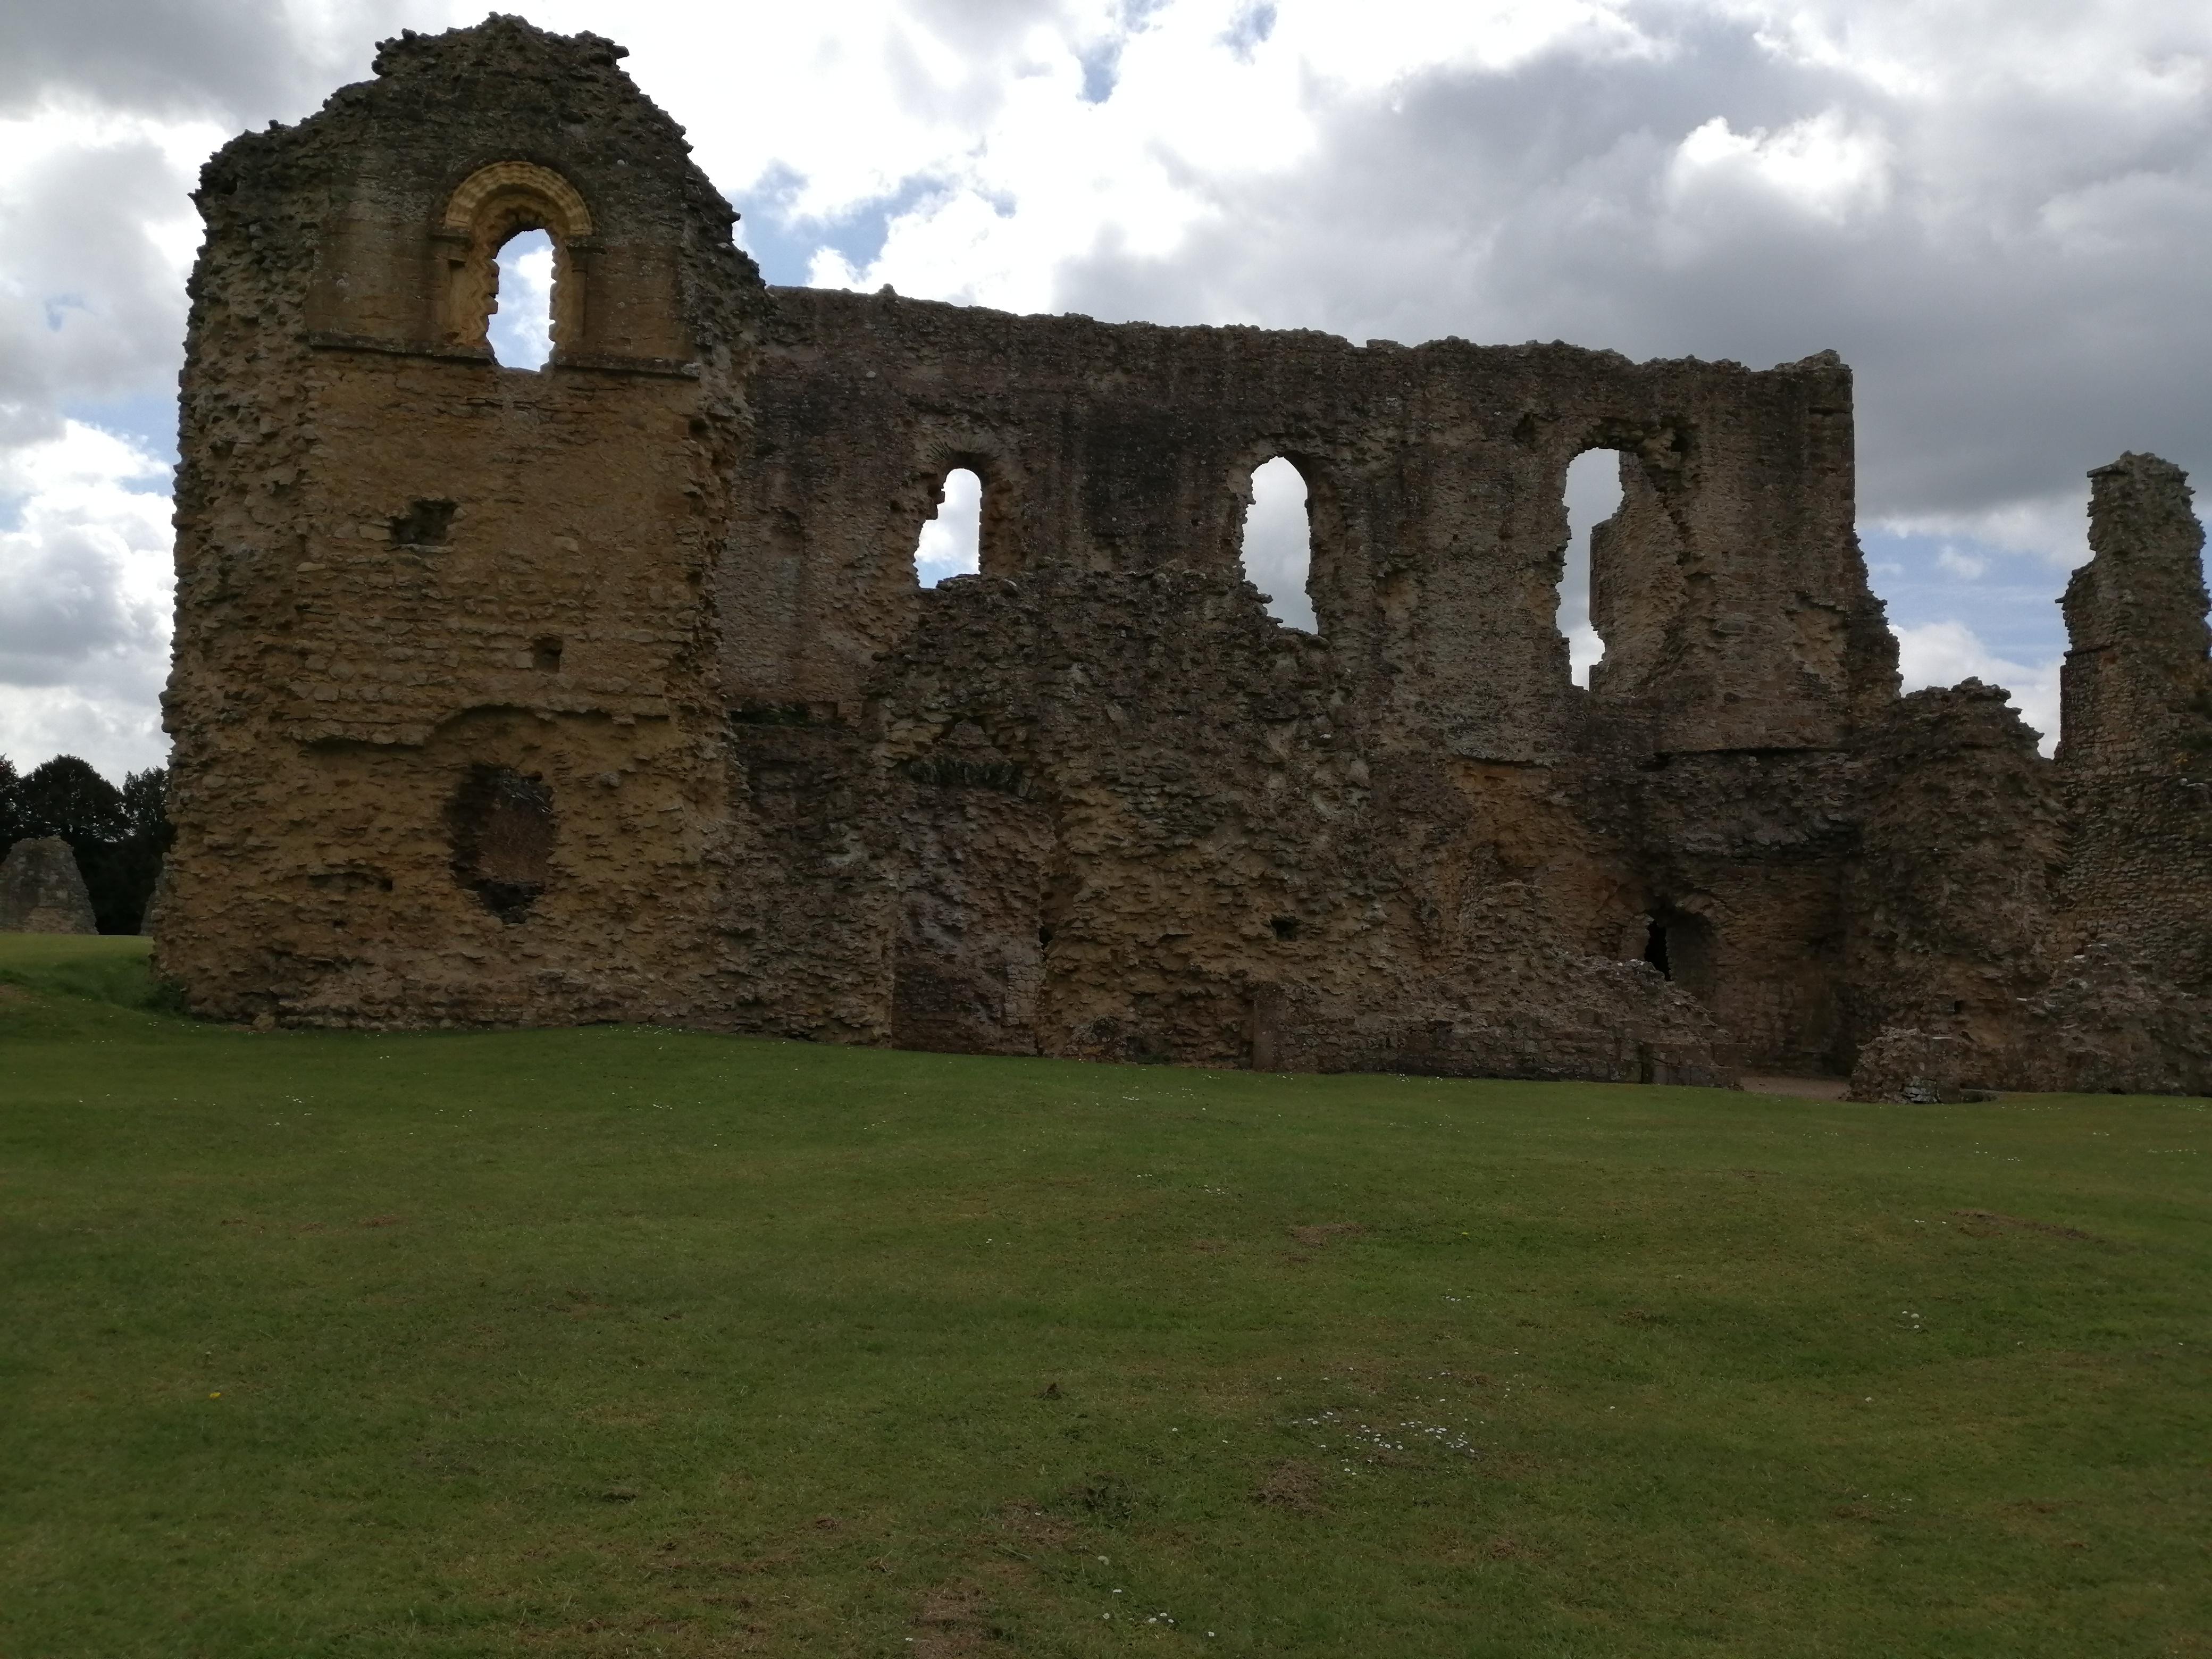 Chapel, Sherborne Old Castle